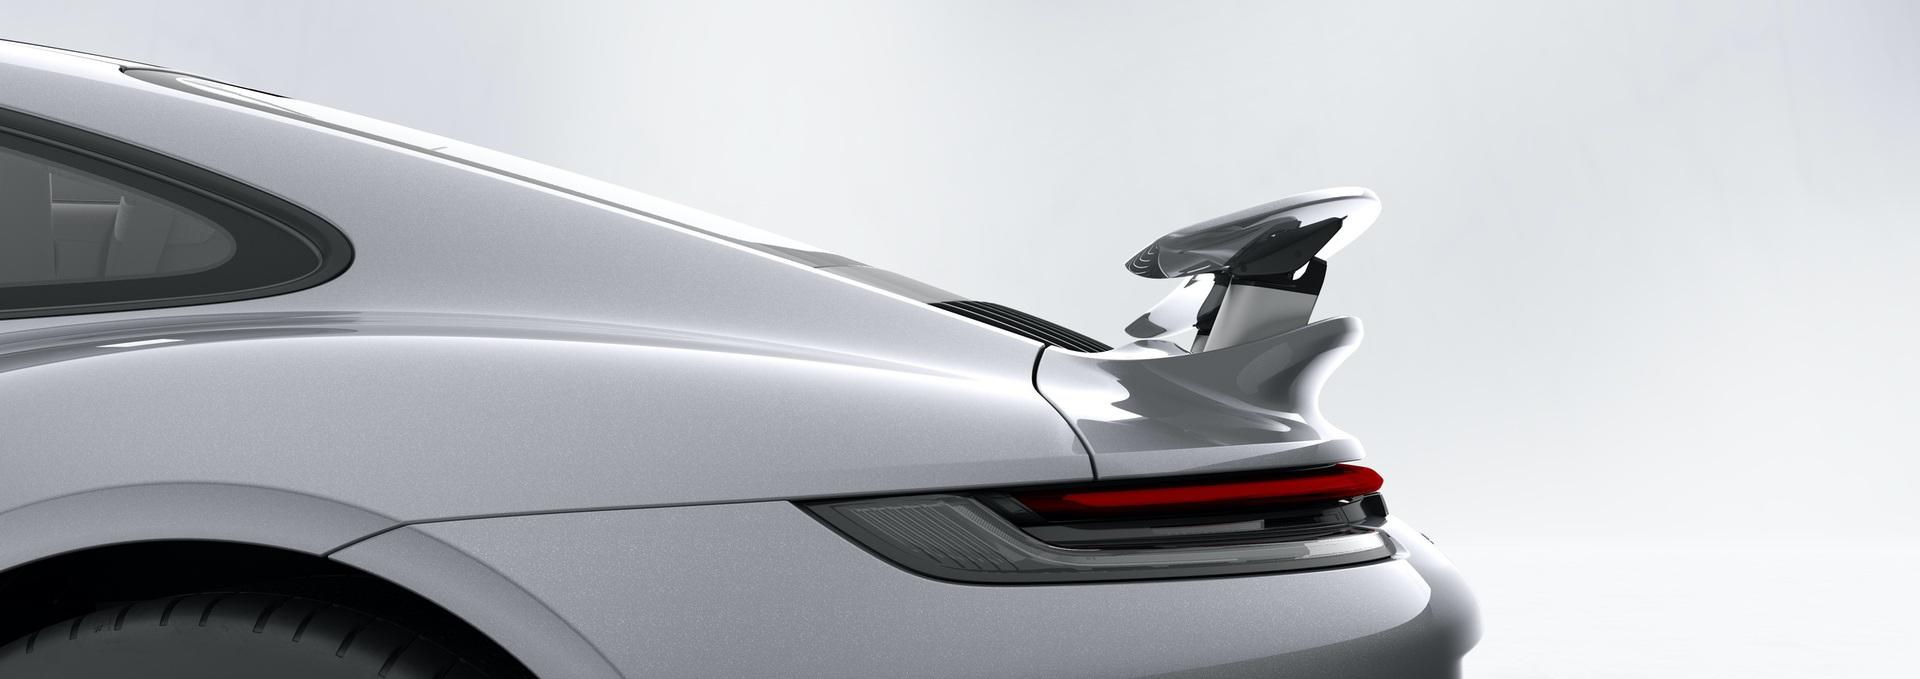 2020_Porsche_911-Turbo_S-aerodynamics_0008